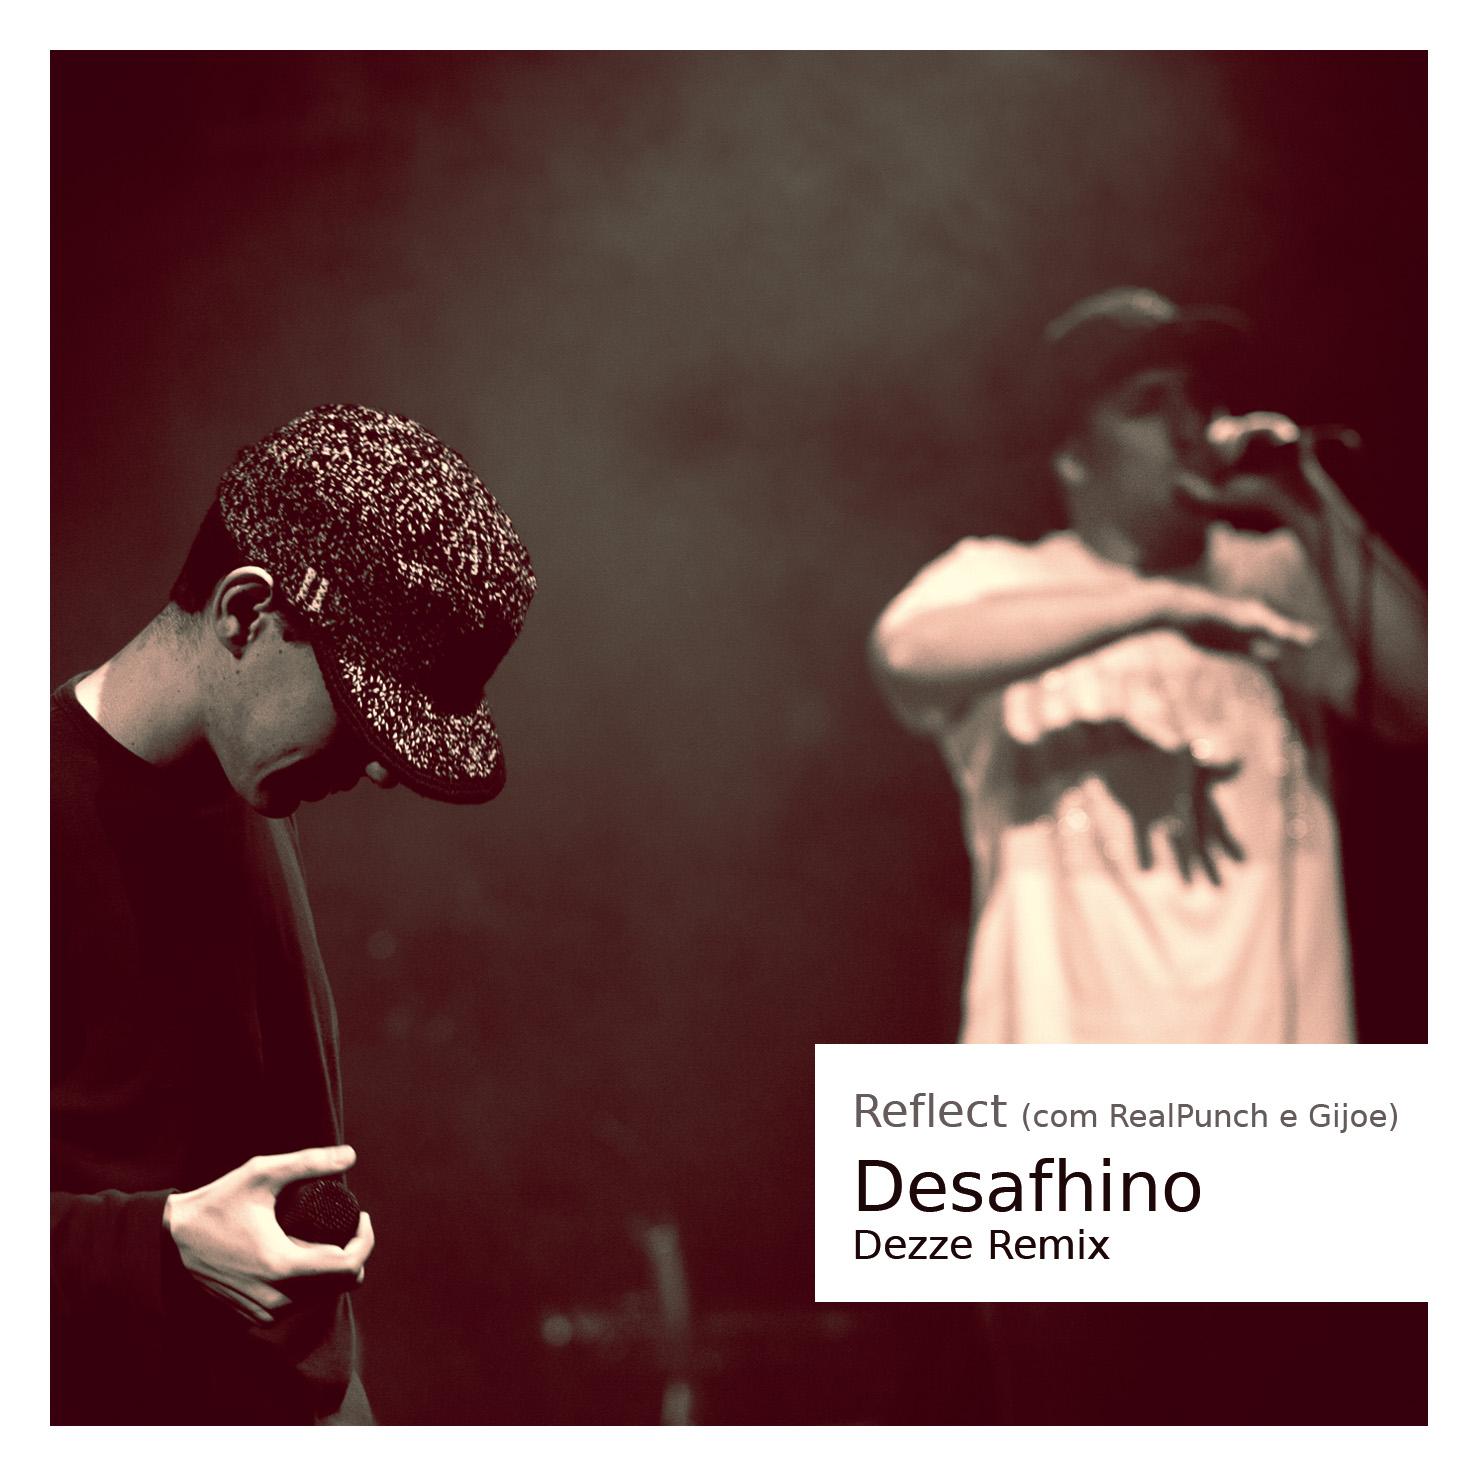 Reflect - Desafhino (com RealPunch e Gijoe) [Dezze Remix]